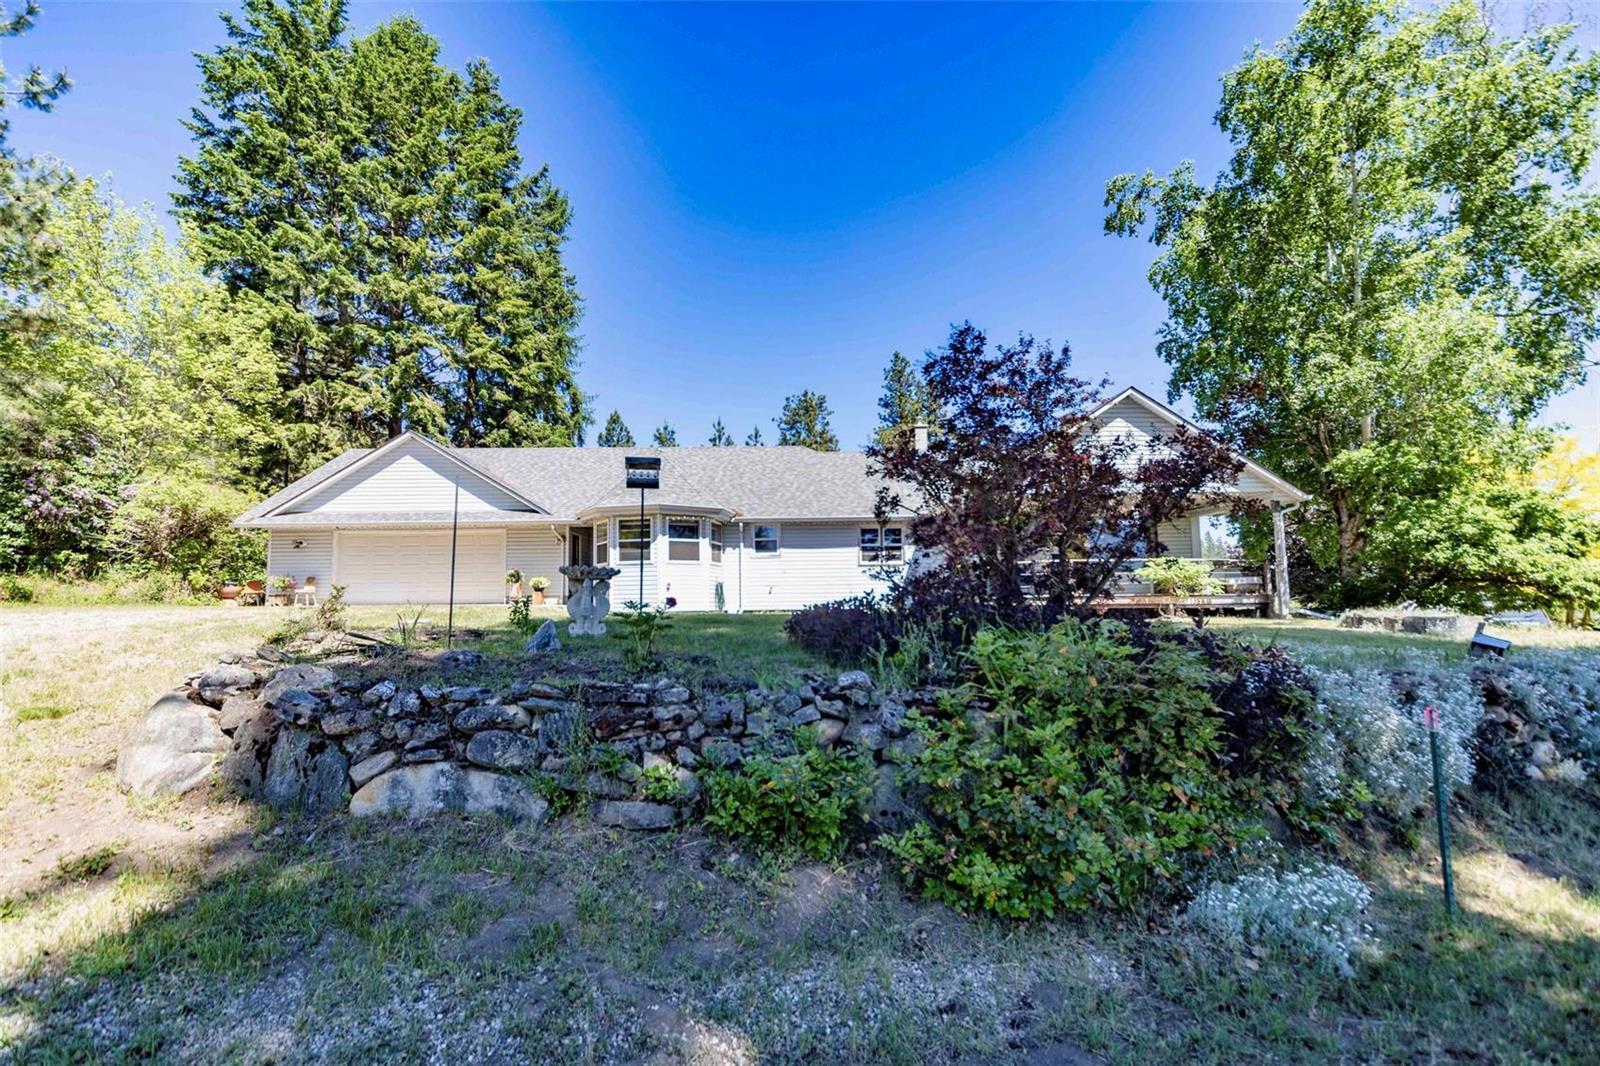 4602 Schubert Road,, Armstrong, British Columbia  V0E 1B4 - Photo 4 - 10232683